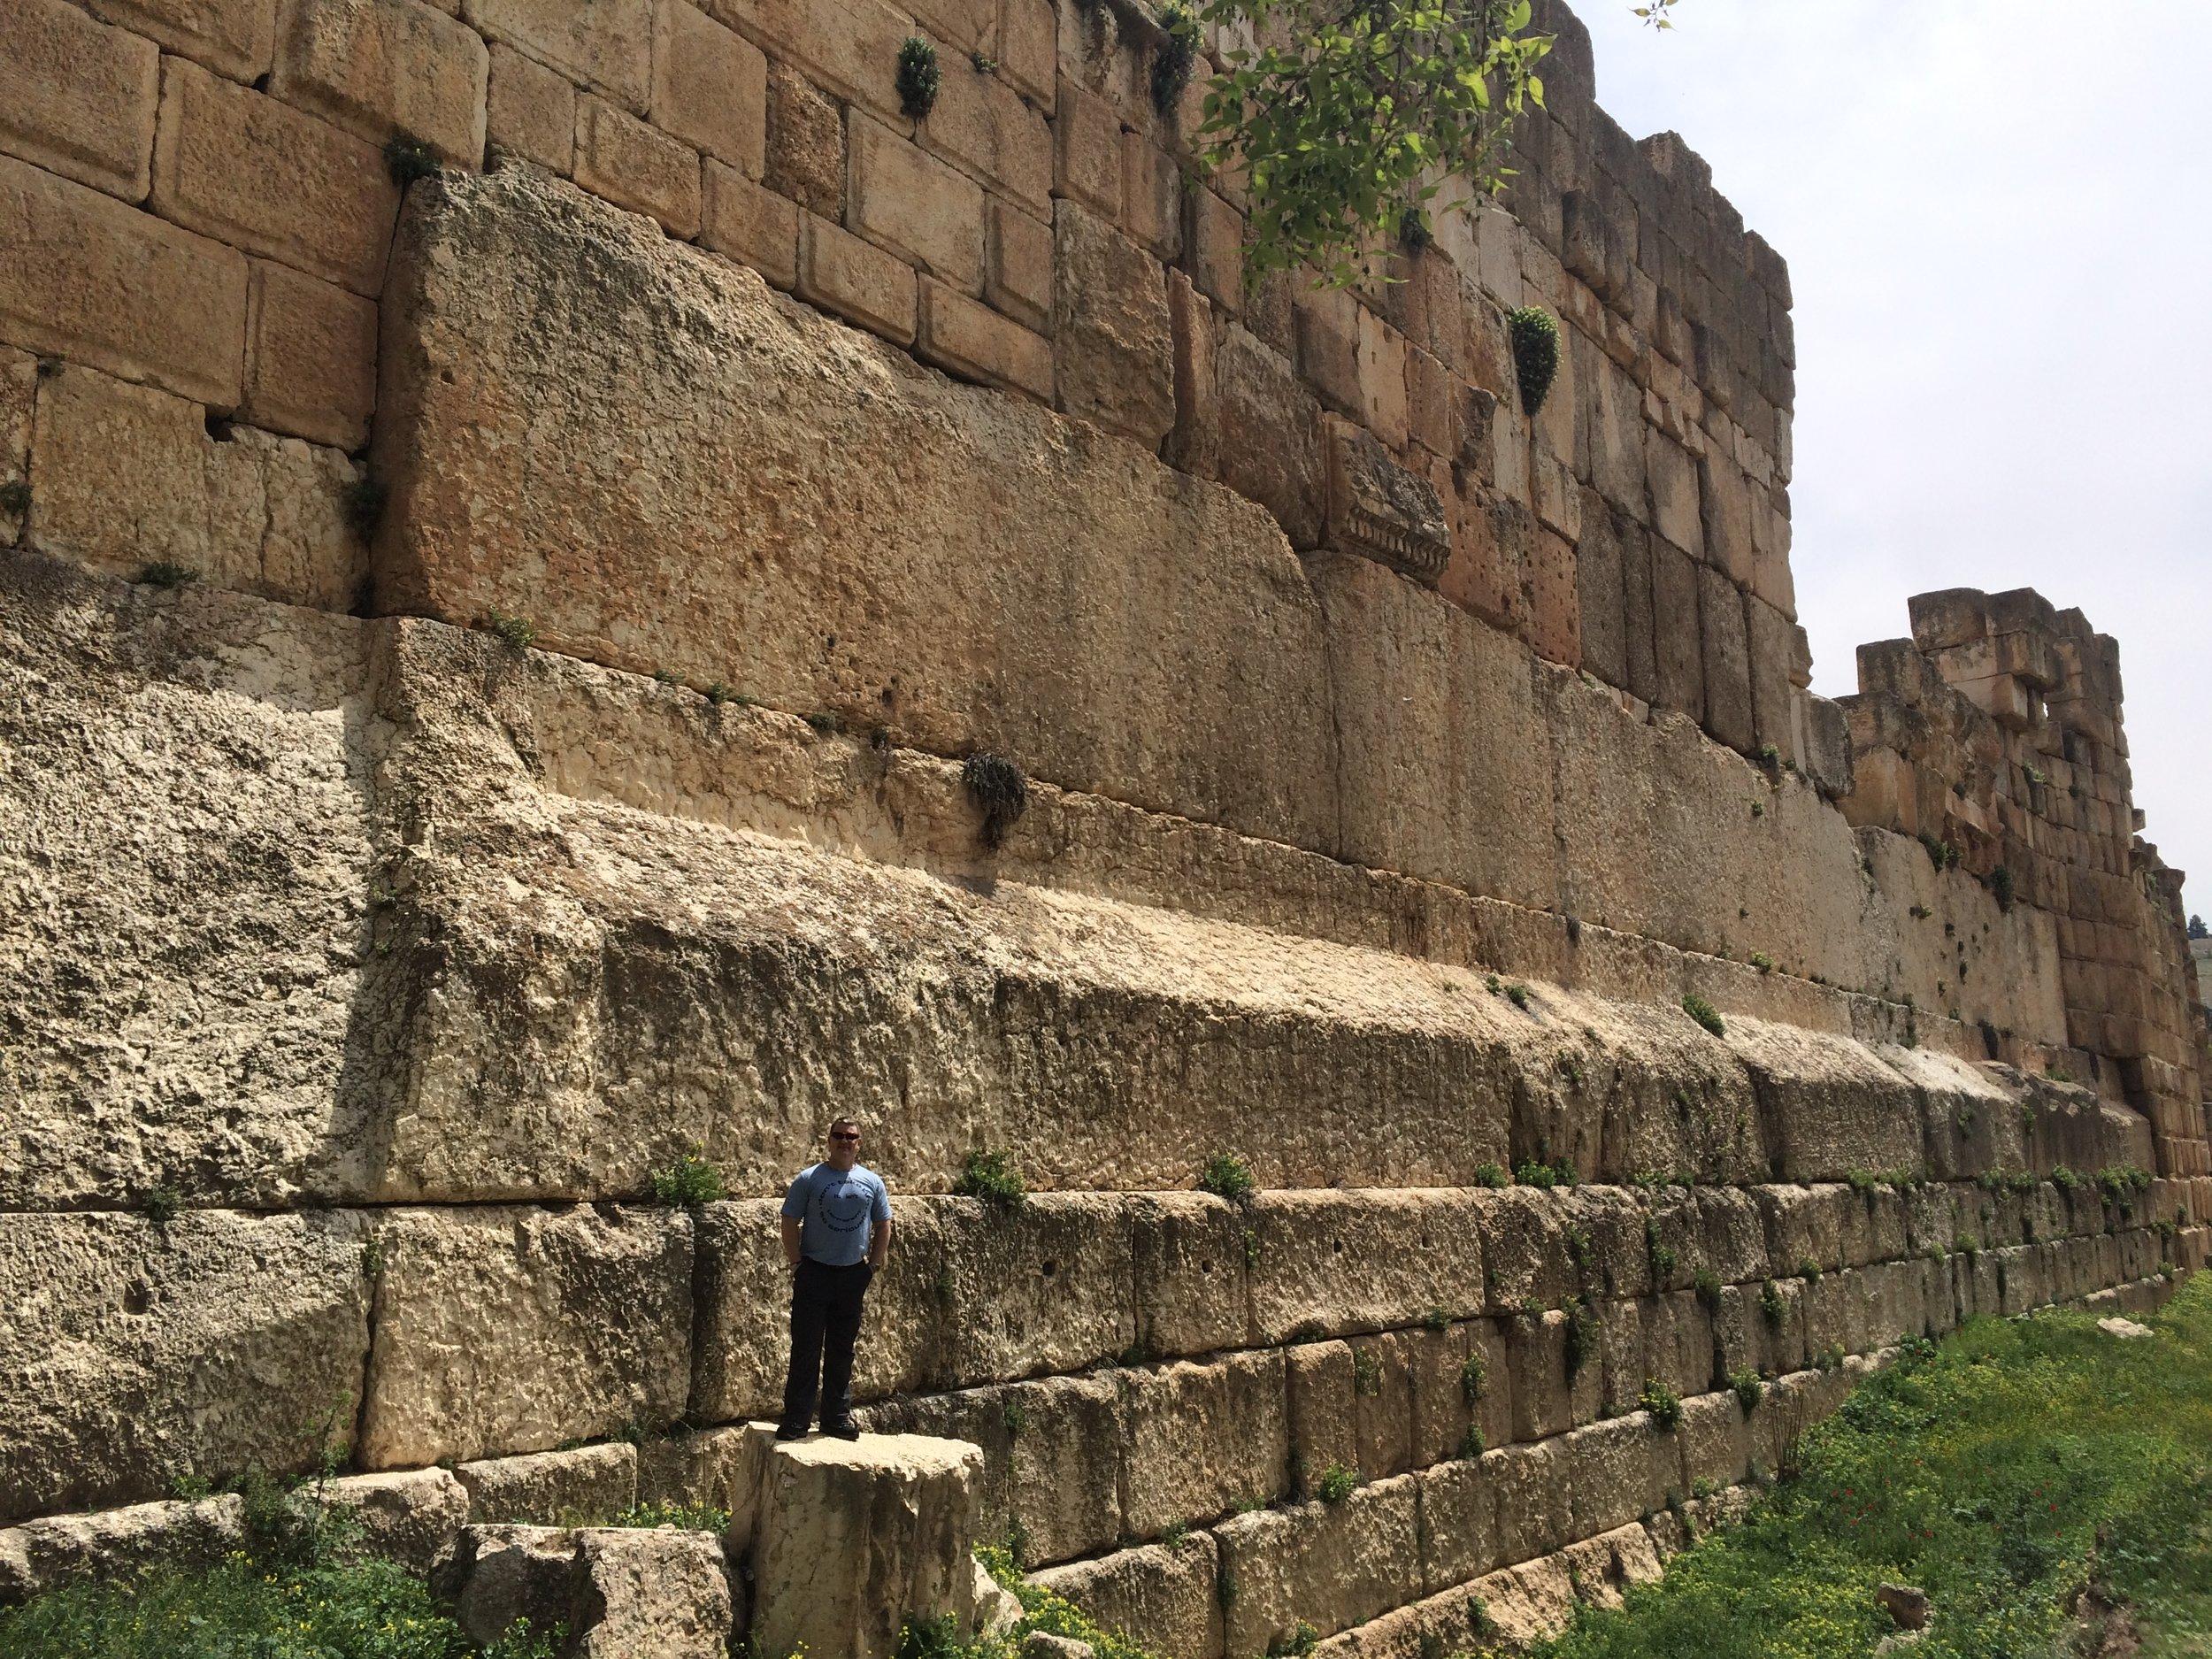 The Trilithon at Baalbek.